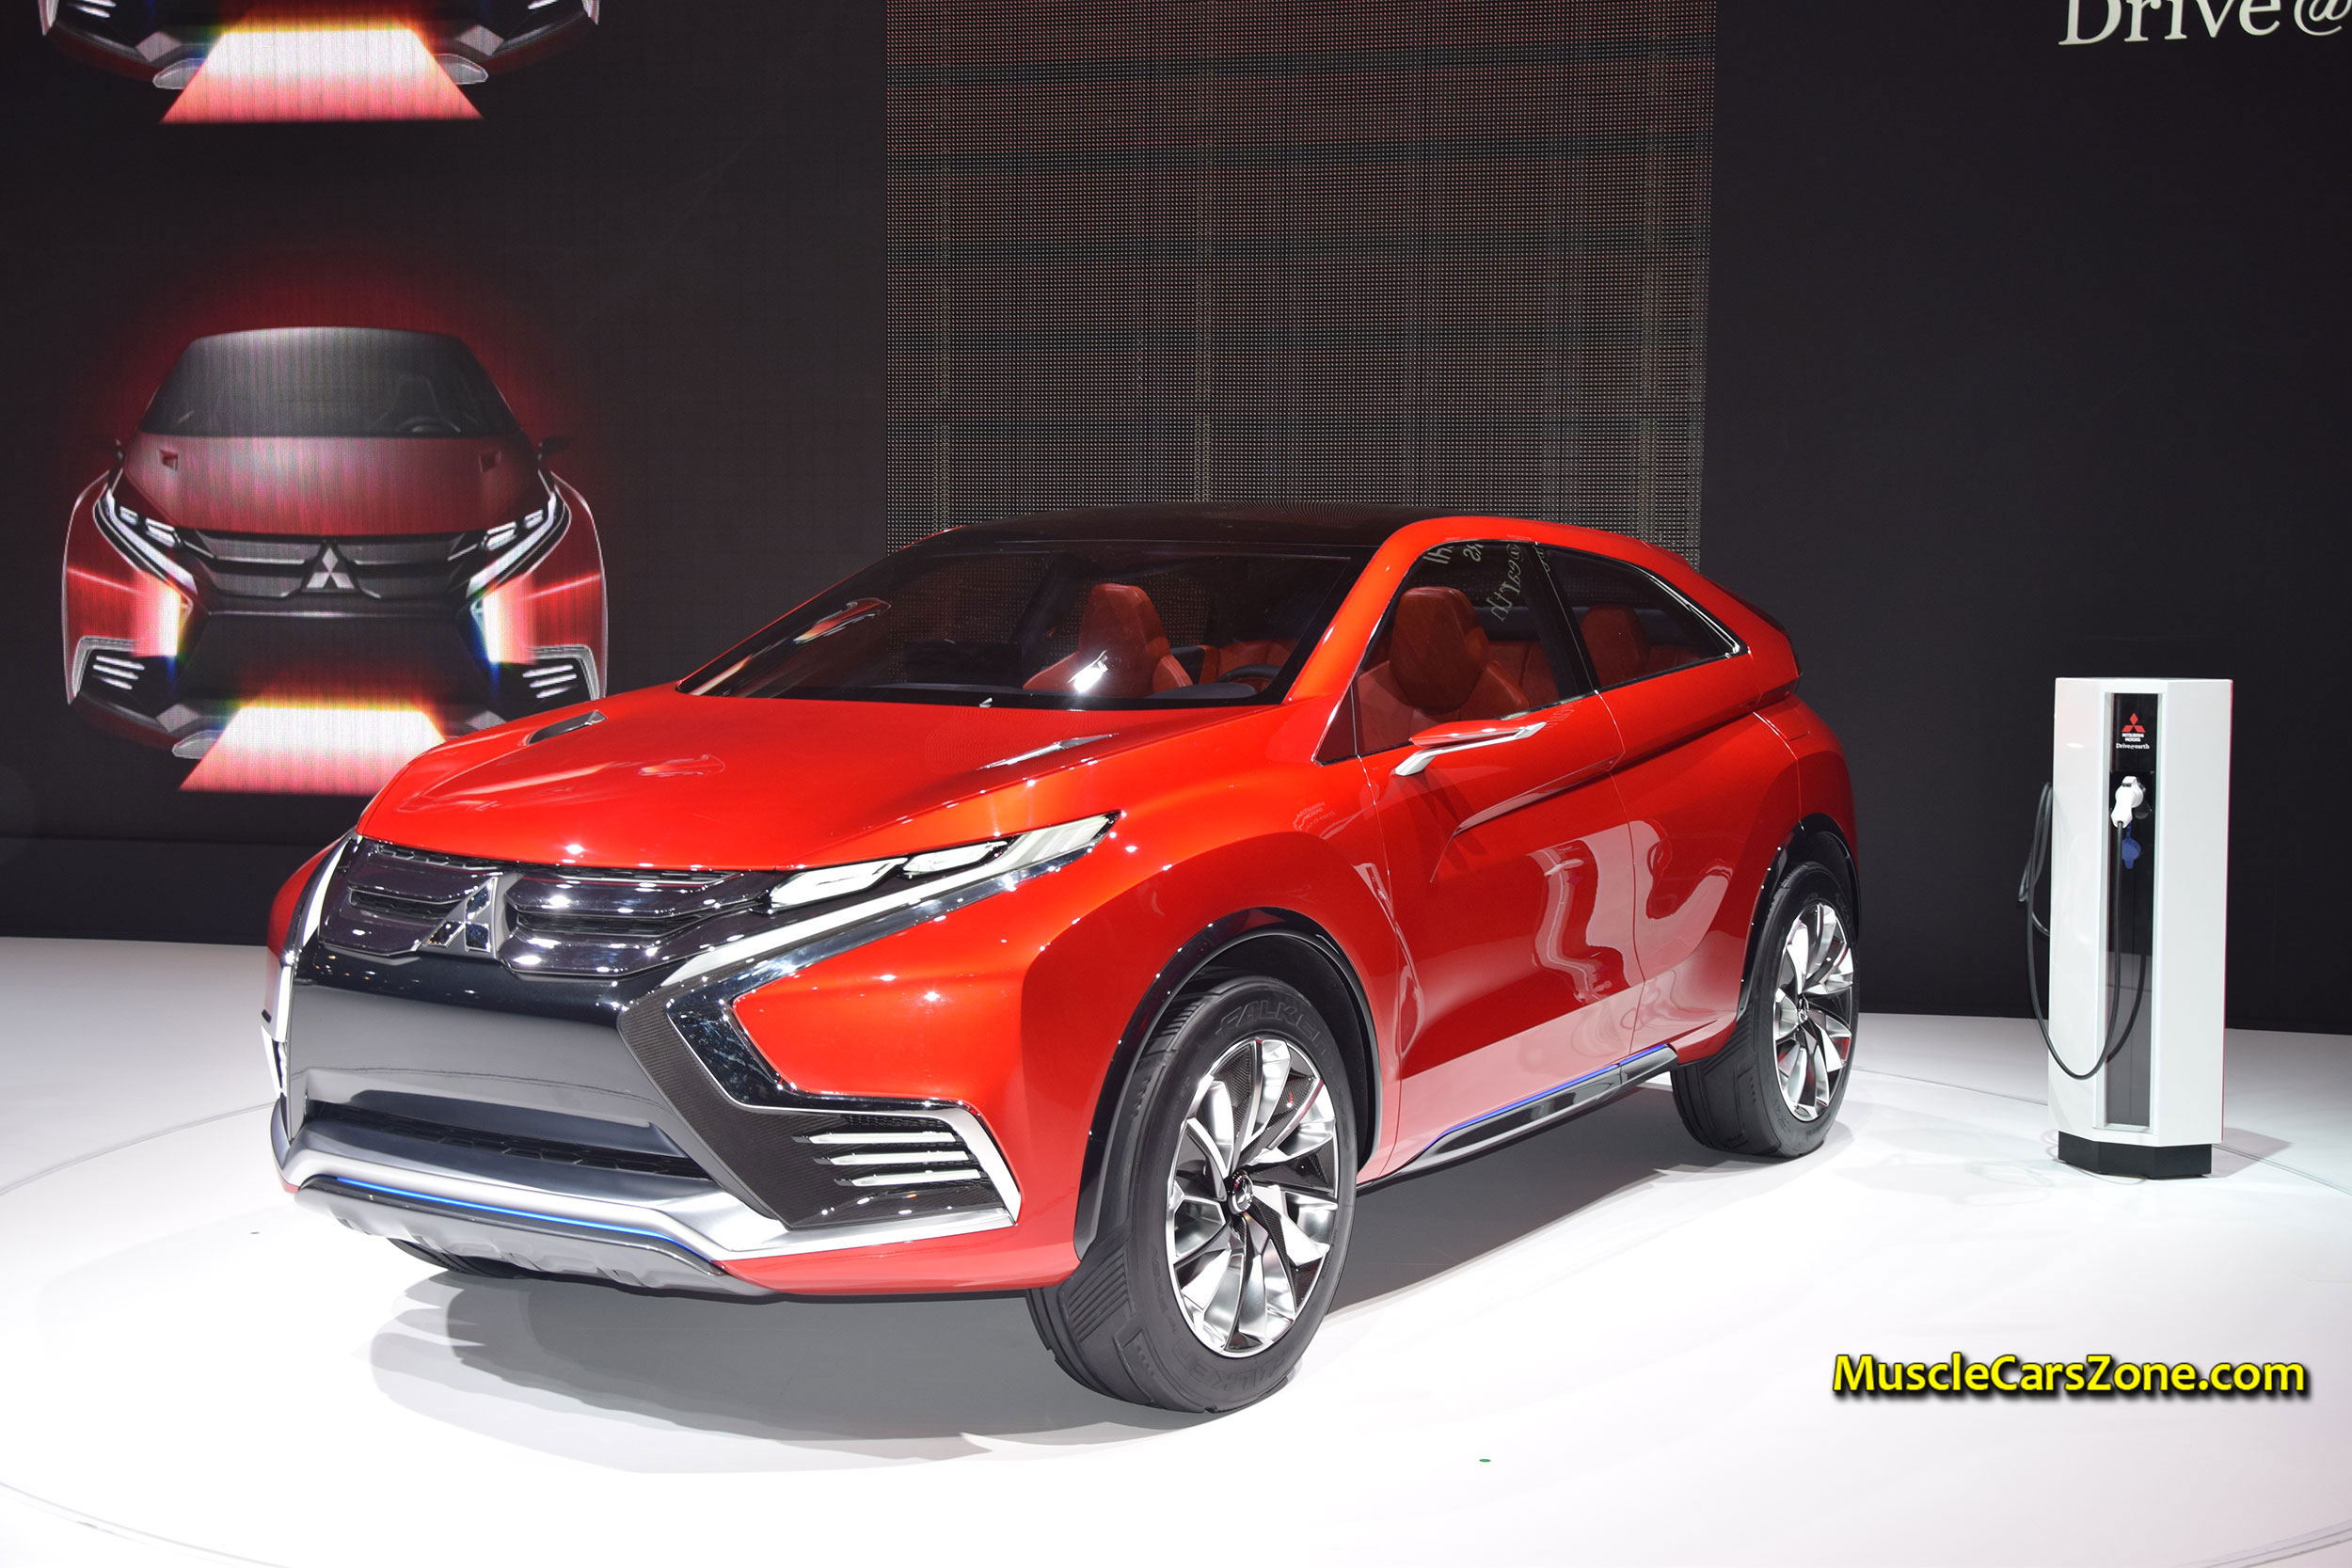 2015-Mitsubishi-Press-Conference---2015-XR-PHEV-II-Concept-10---2015-Geneva-Motor-Show.JPG